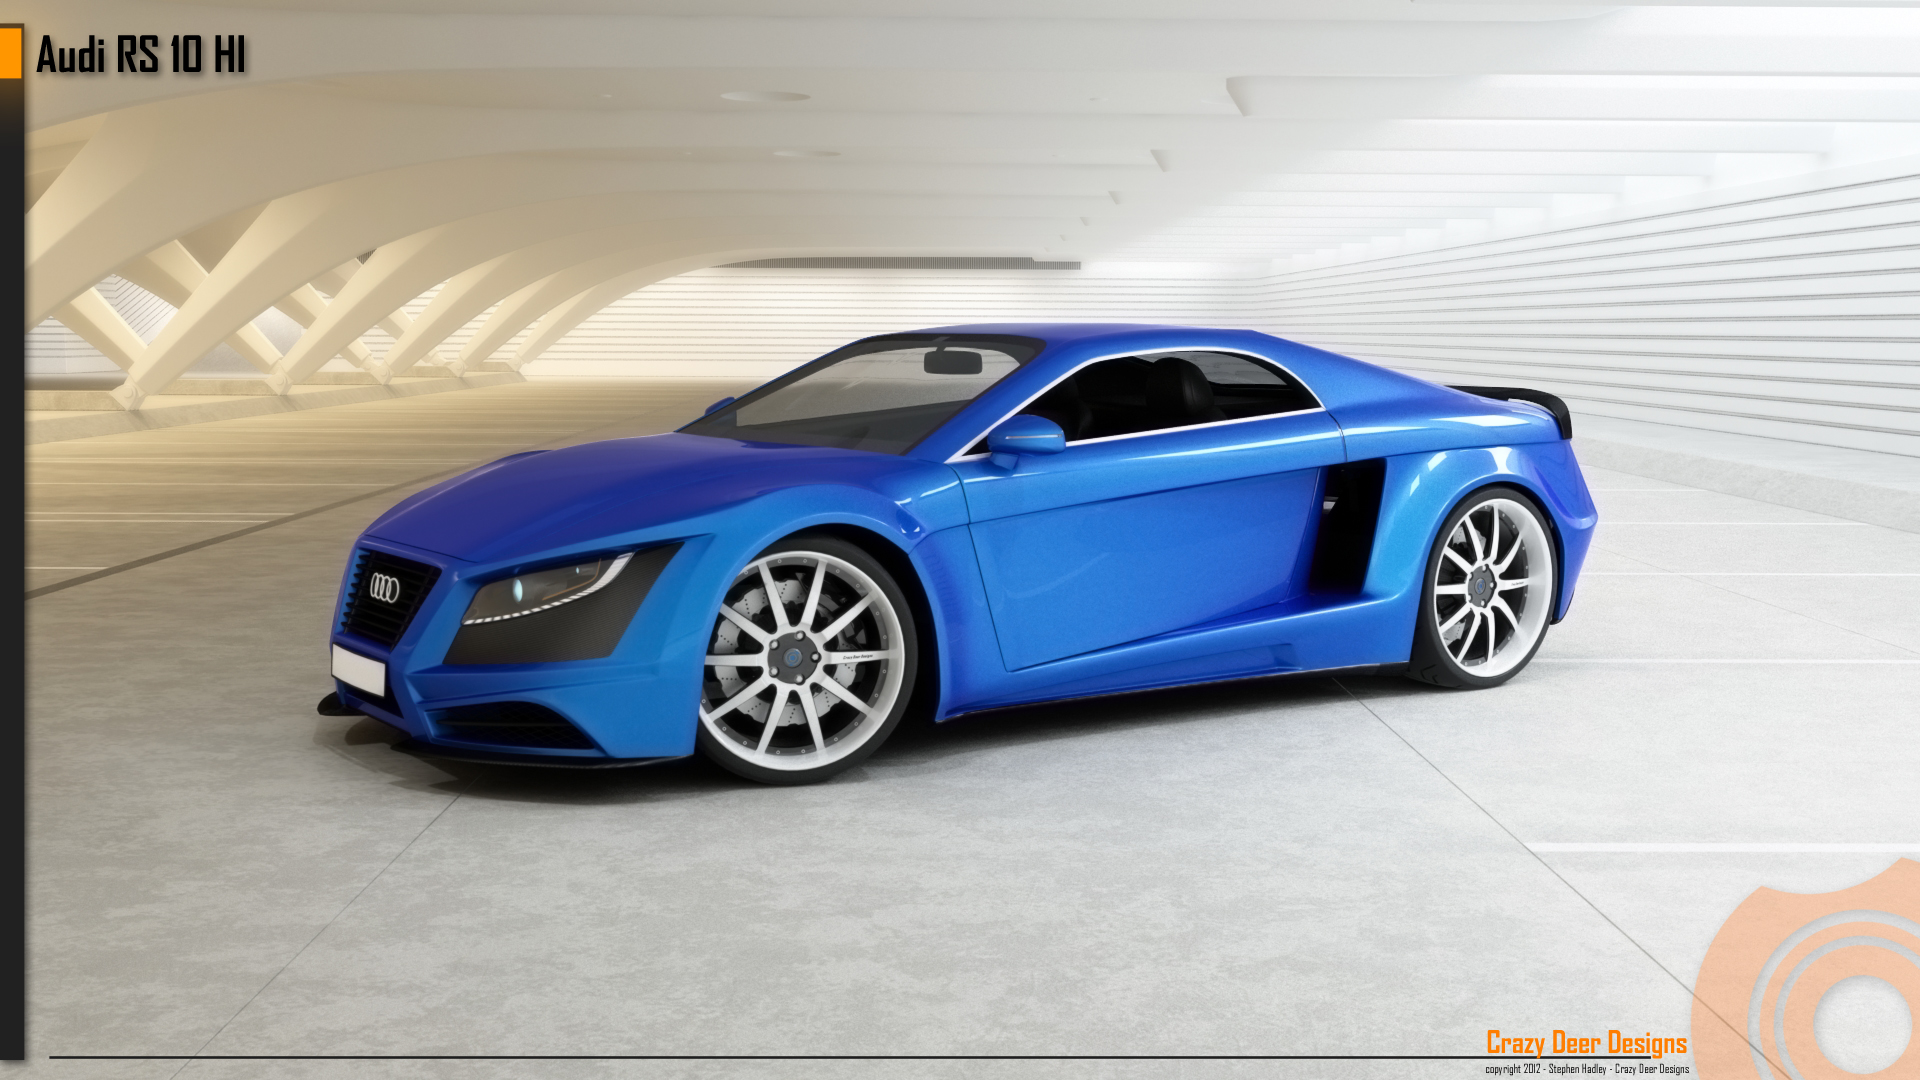 Kekurangan Audi Rs10 Harga